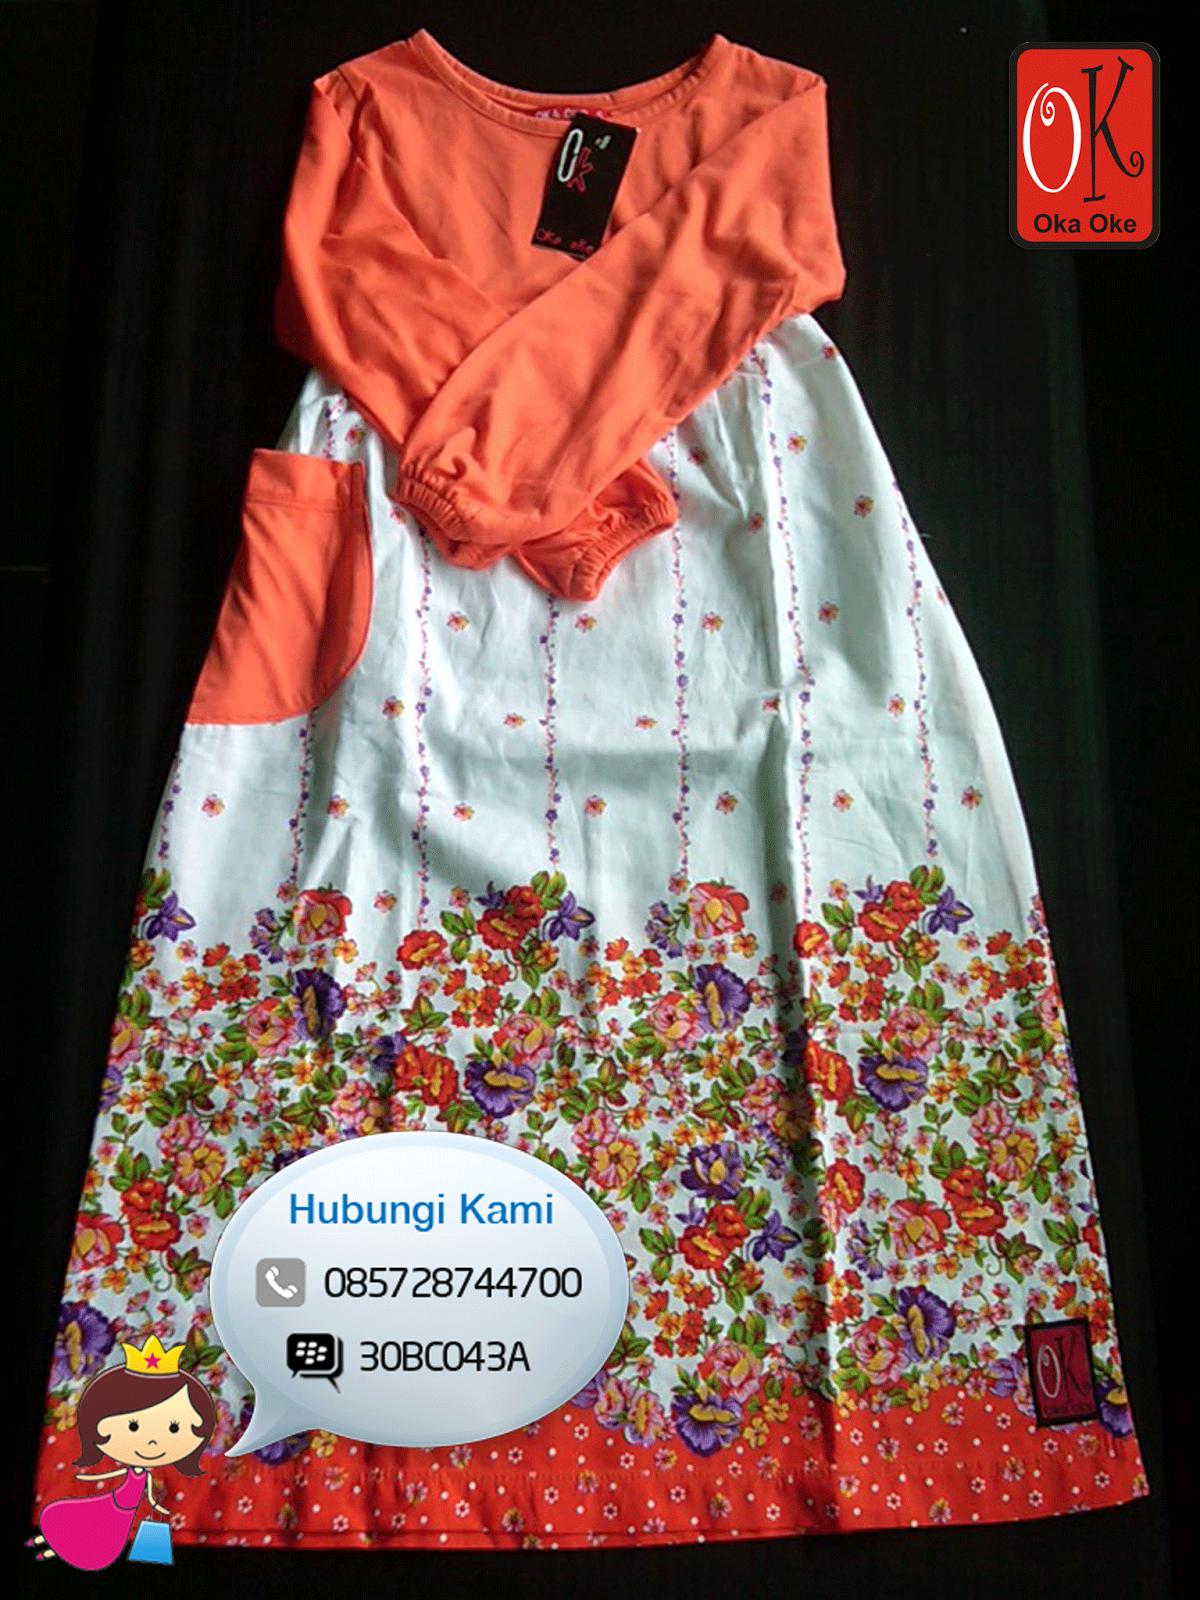 Gamis Anak Oka Oke Model Terbaru Baju Gamis Anak Oka Oke